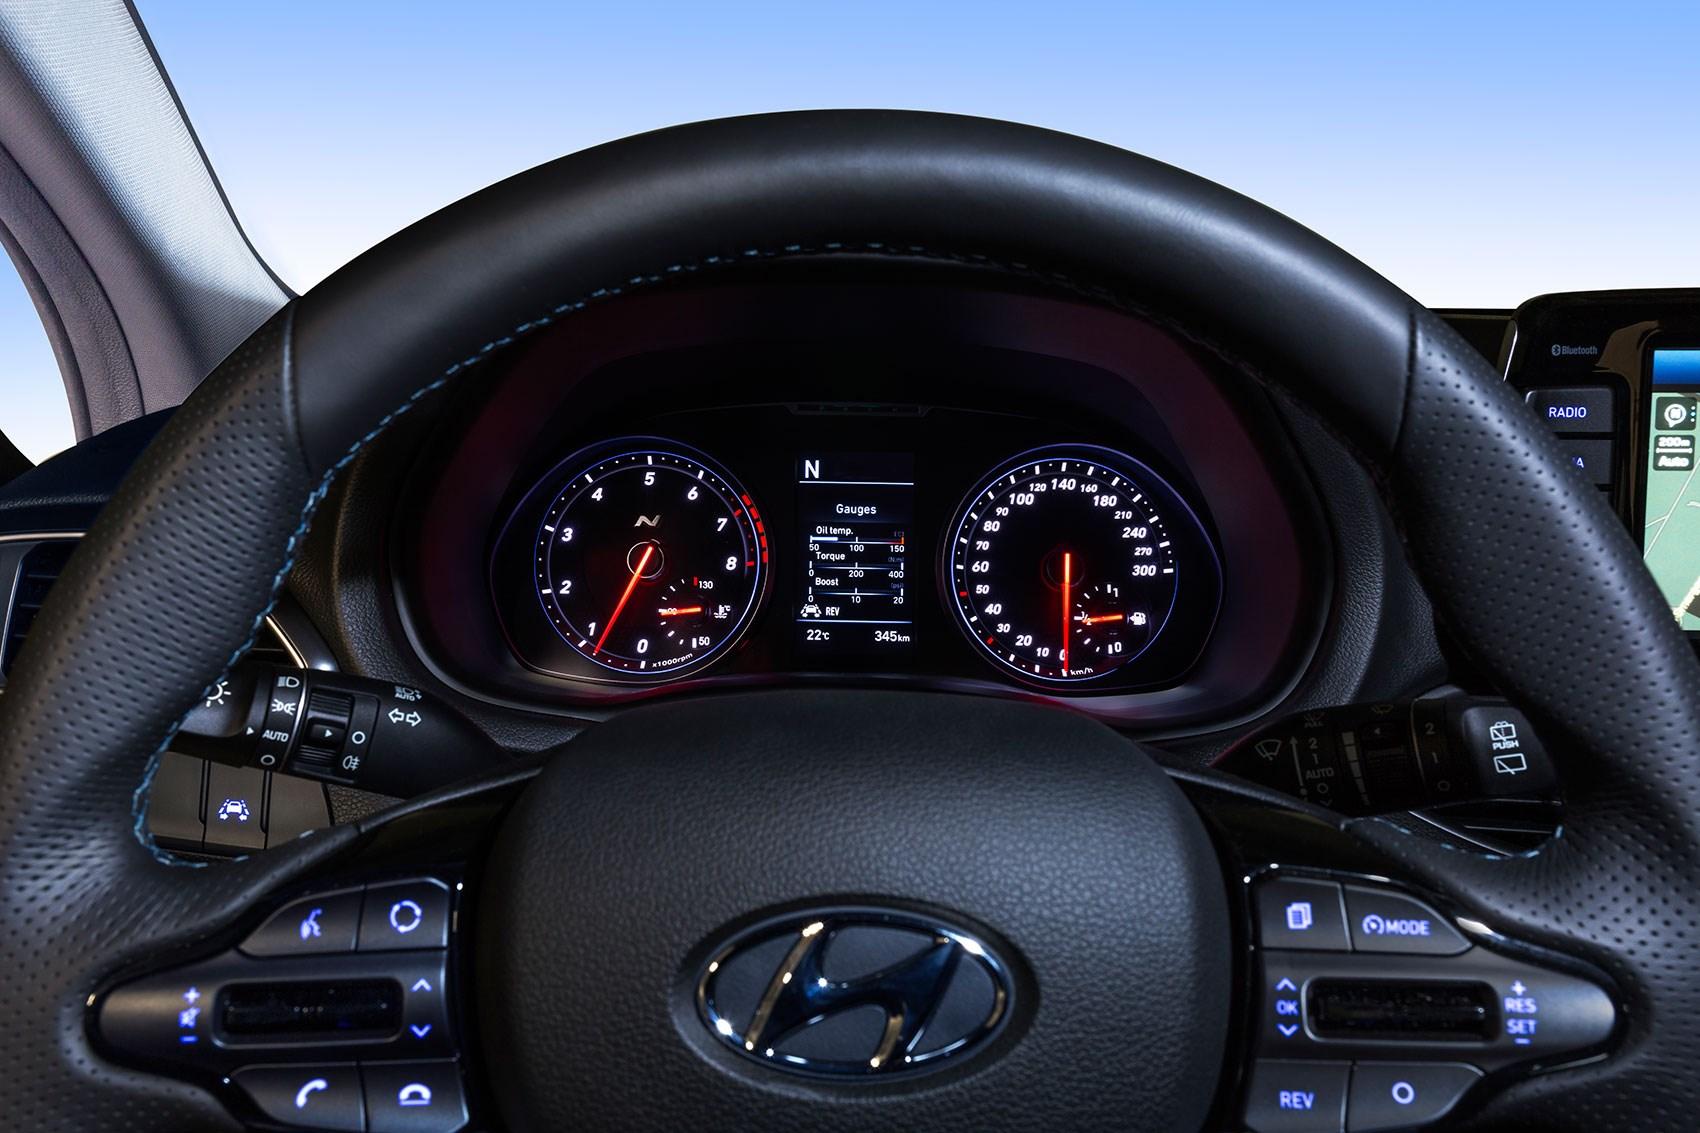 Hyundai I30n >> Hyundai I30n And I30 Fastback Revealed In Pictures By Car Magazine